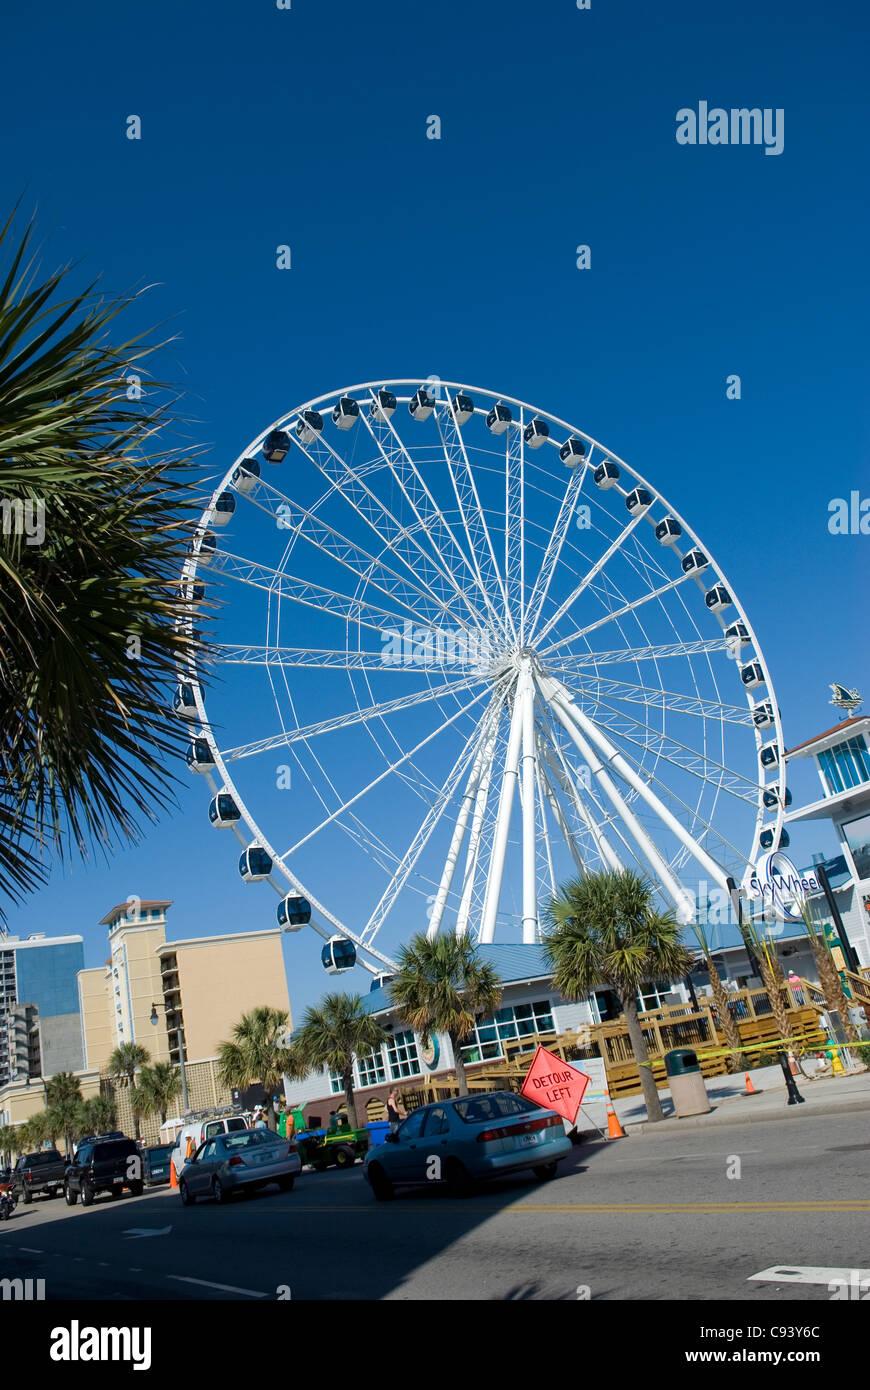 Sky wheel Myrtle Beach South Carolina USA - Stock Image